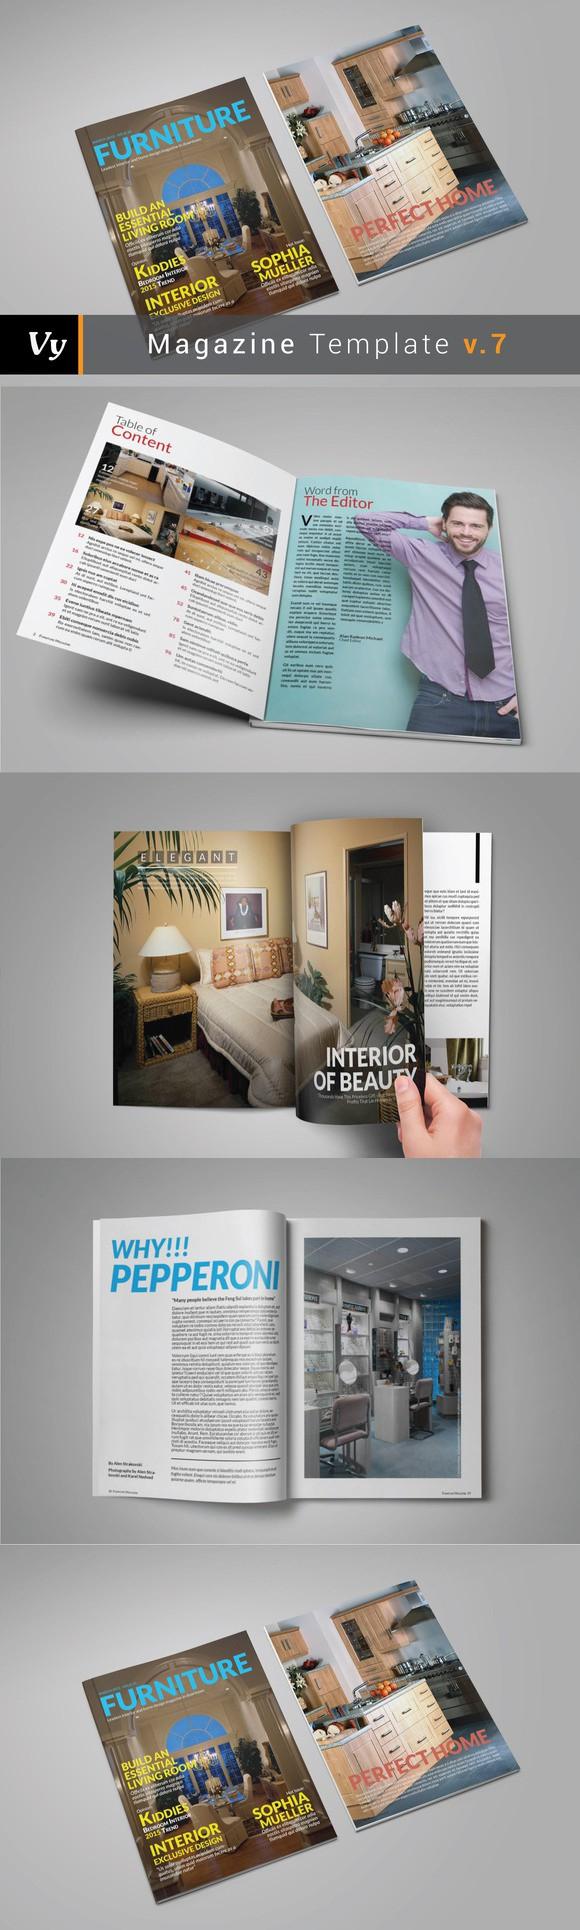 Furniture Magazine Template | Pinterest